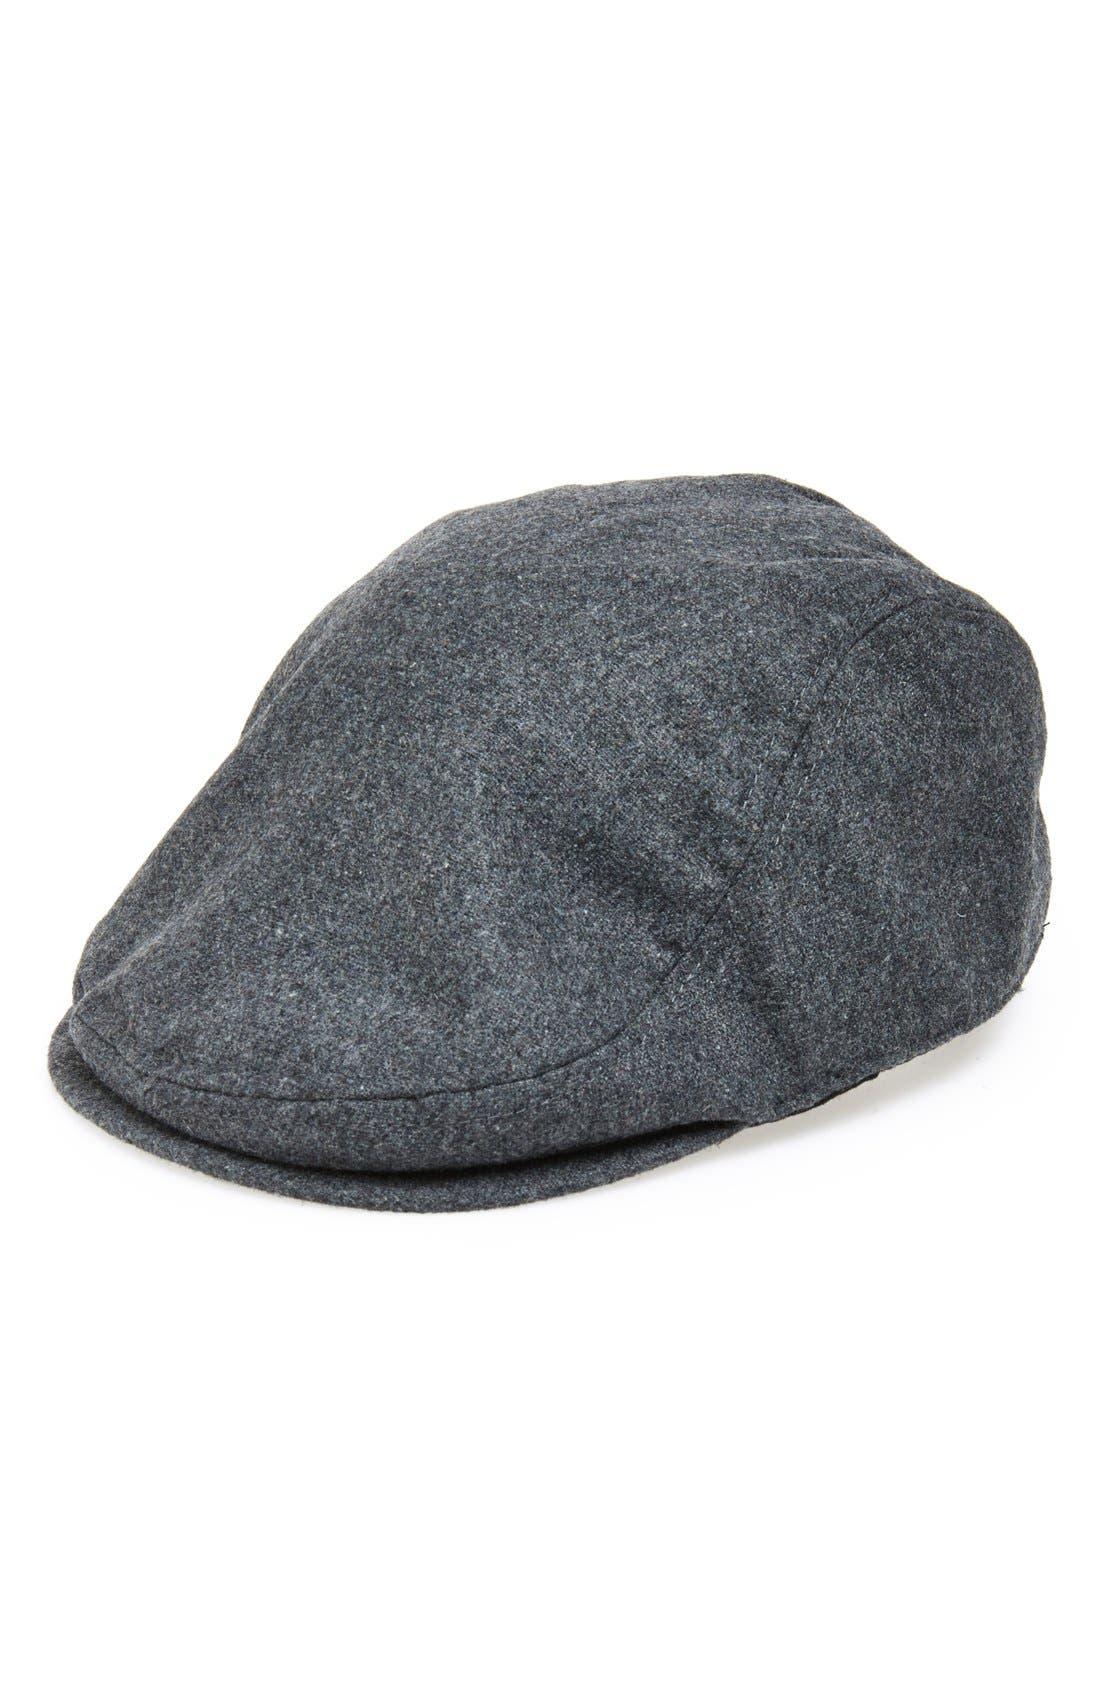 Men's Glory Hats By Goorin 'Mikey' Driving Cap